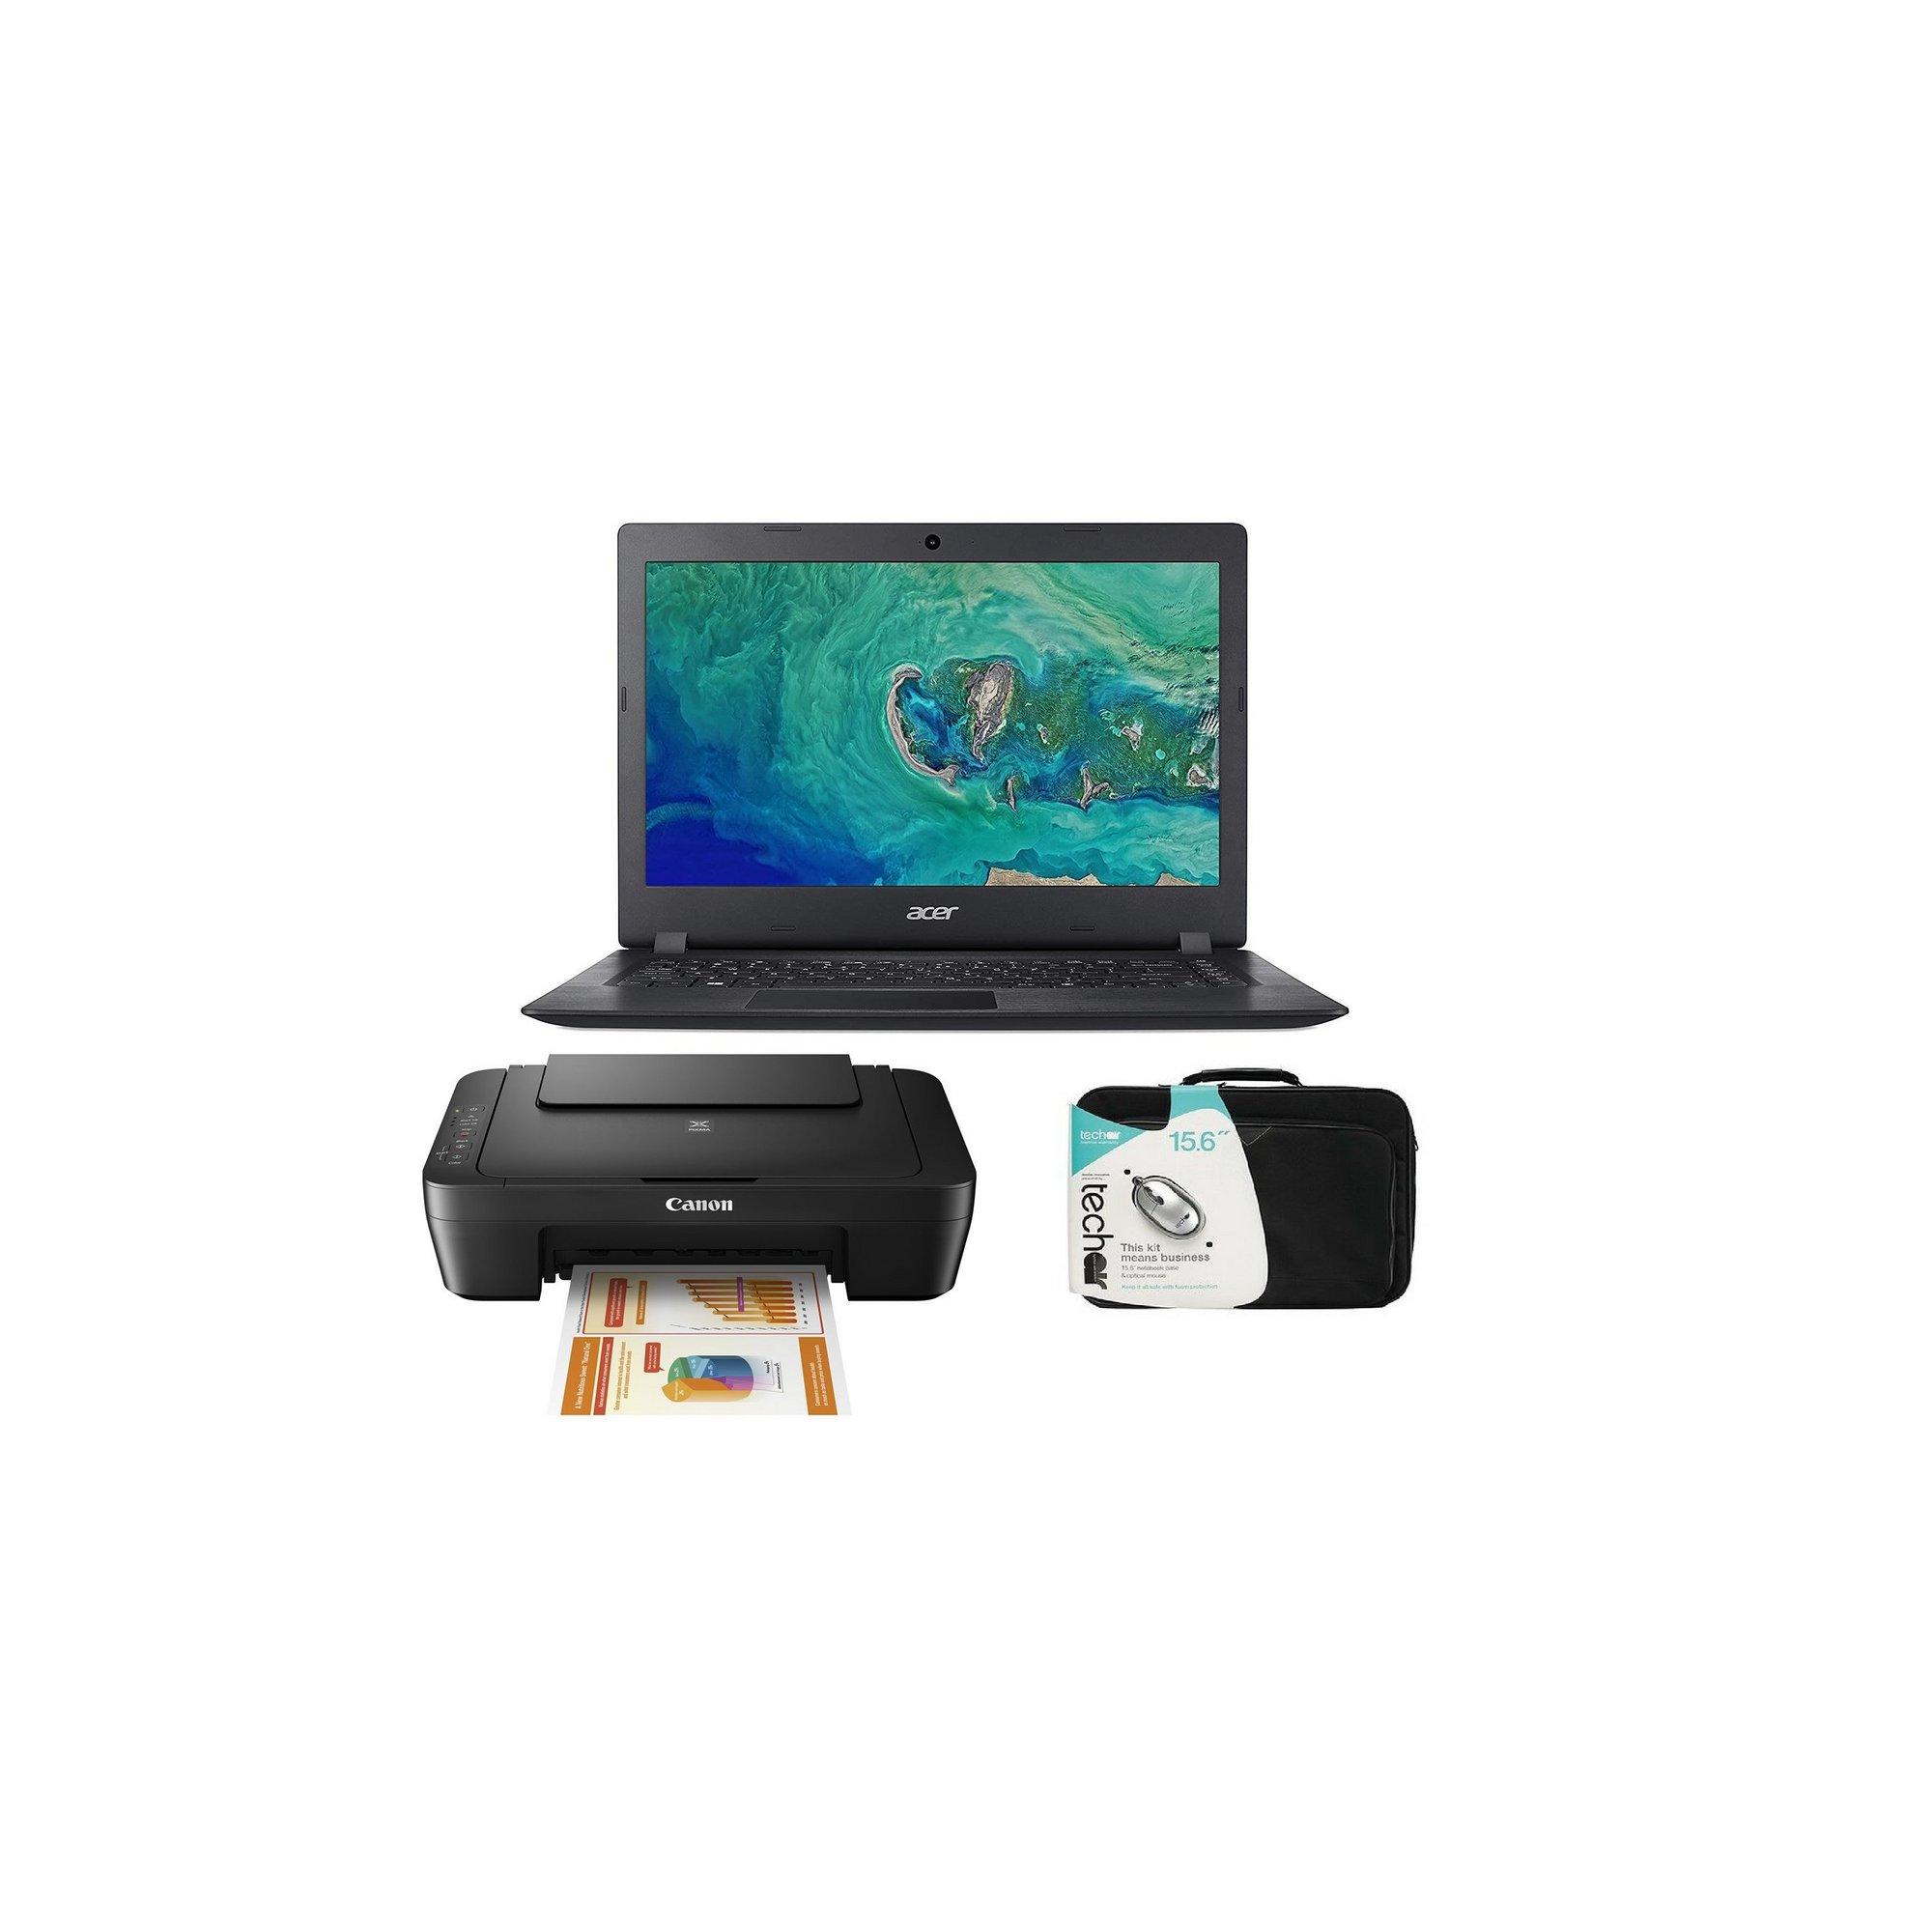 Image of Acer Aspire 1 14 Inch Intel Windows 10 Home 4GB 64GB Laptop Bundle